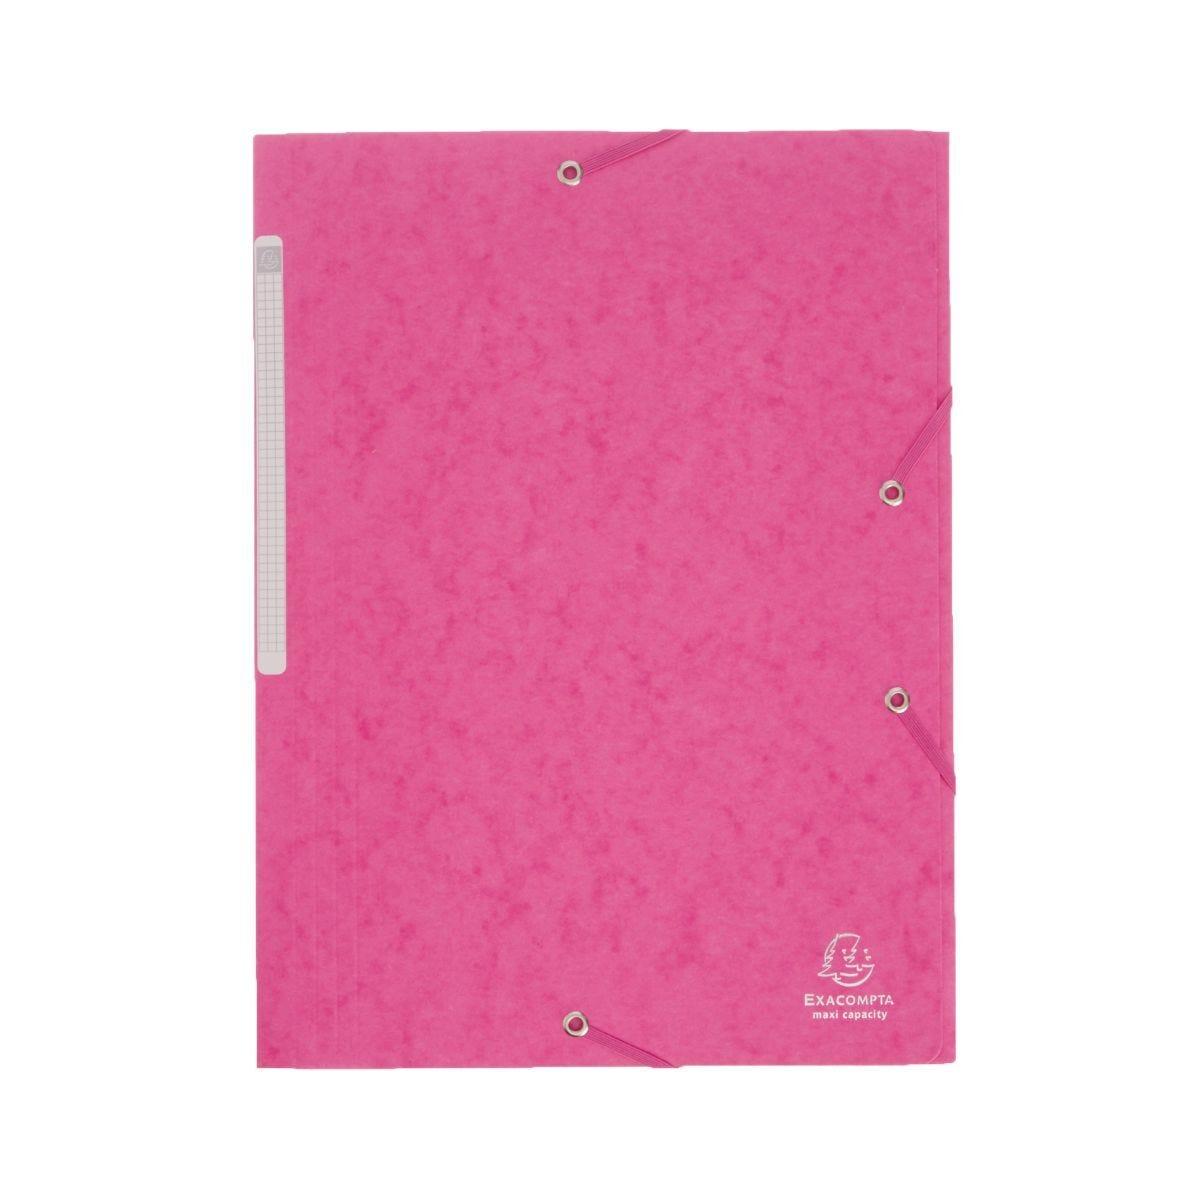 Exacompta Portfolio A4 Pink